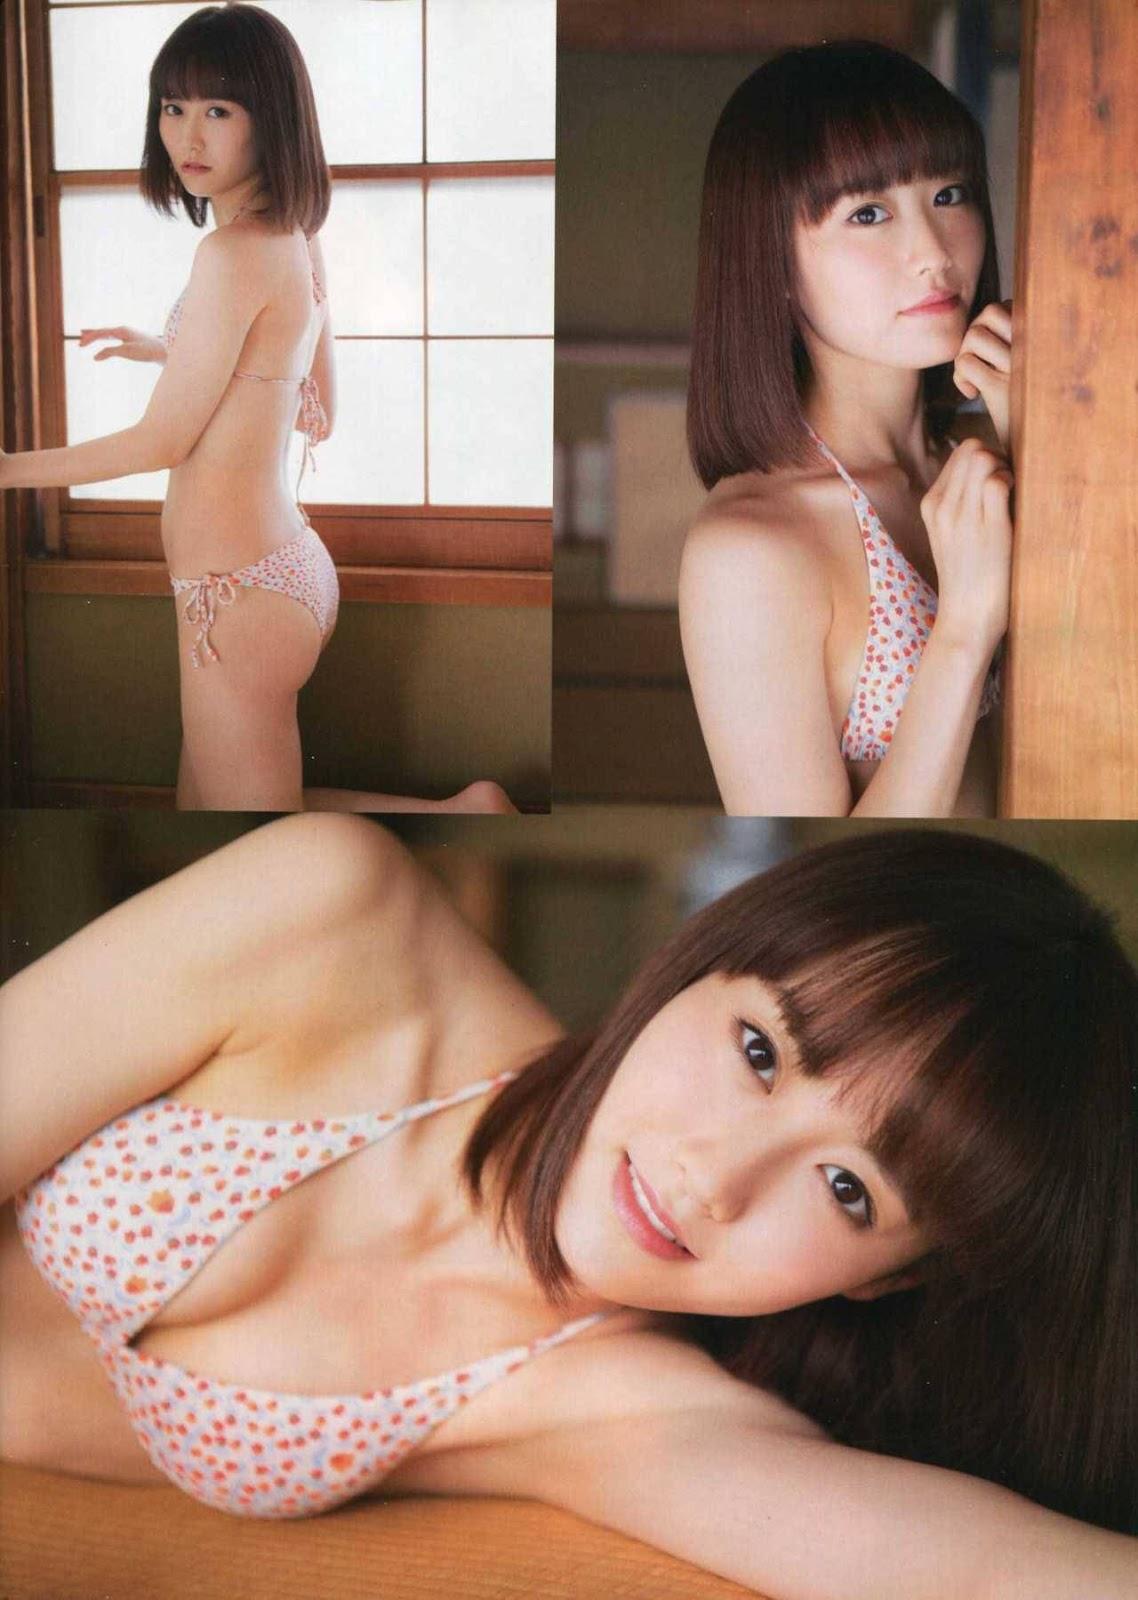 Homma Hinata 本間日陽, Nishigata Marina 西潟茉莉奈, ENTAME 2018 No.01 (月刊エンタメ 2018年1月号)